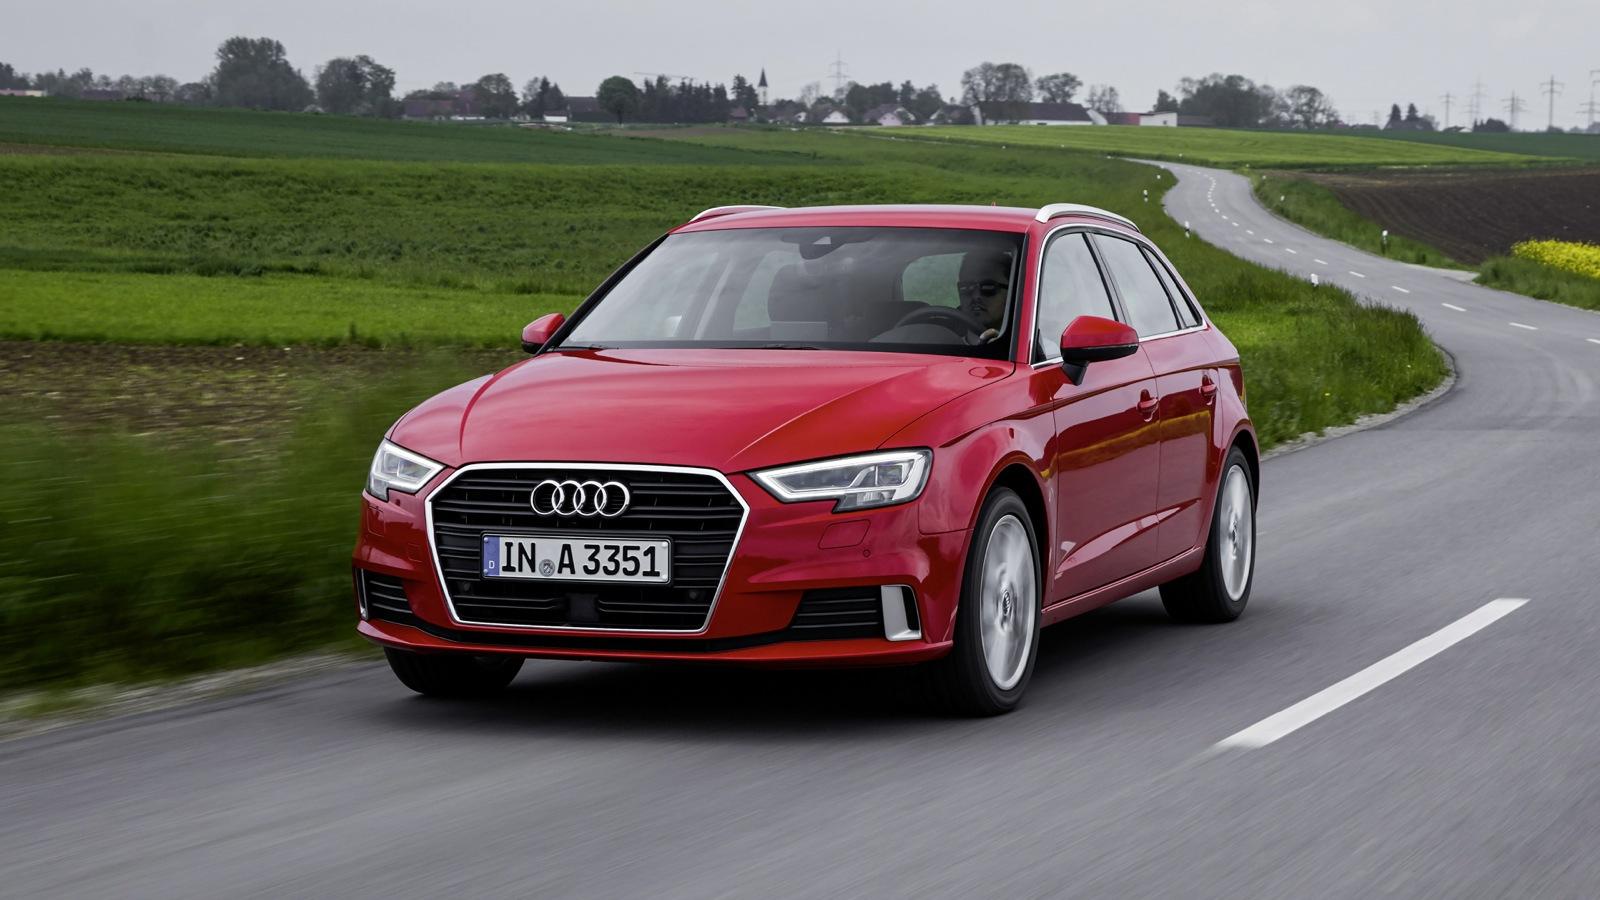 2017 Audi A3 Sportback Review | CarAdvice